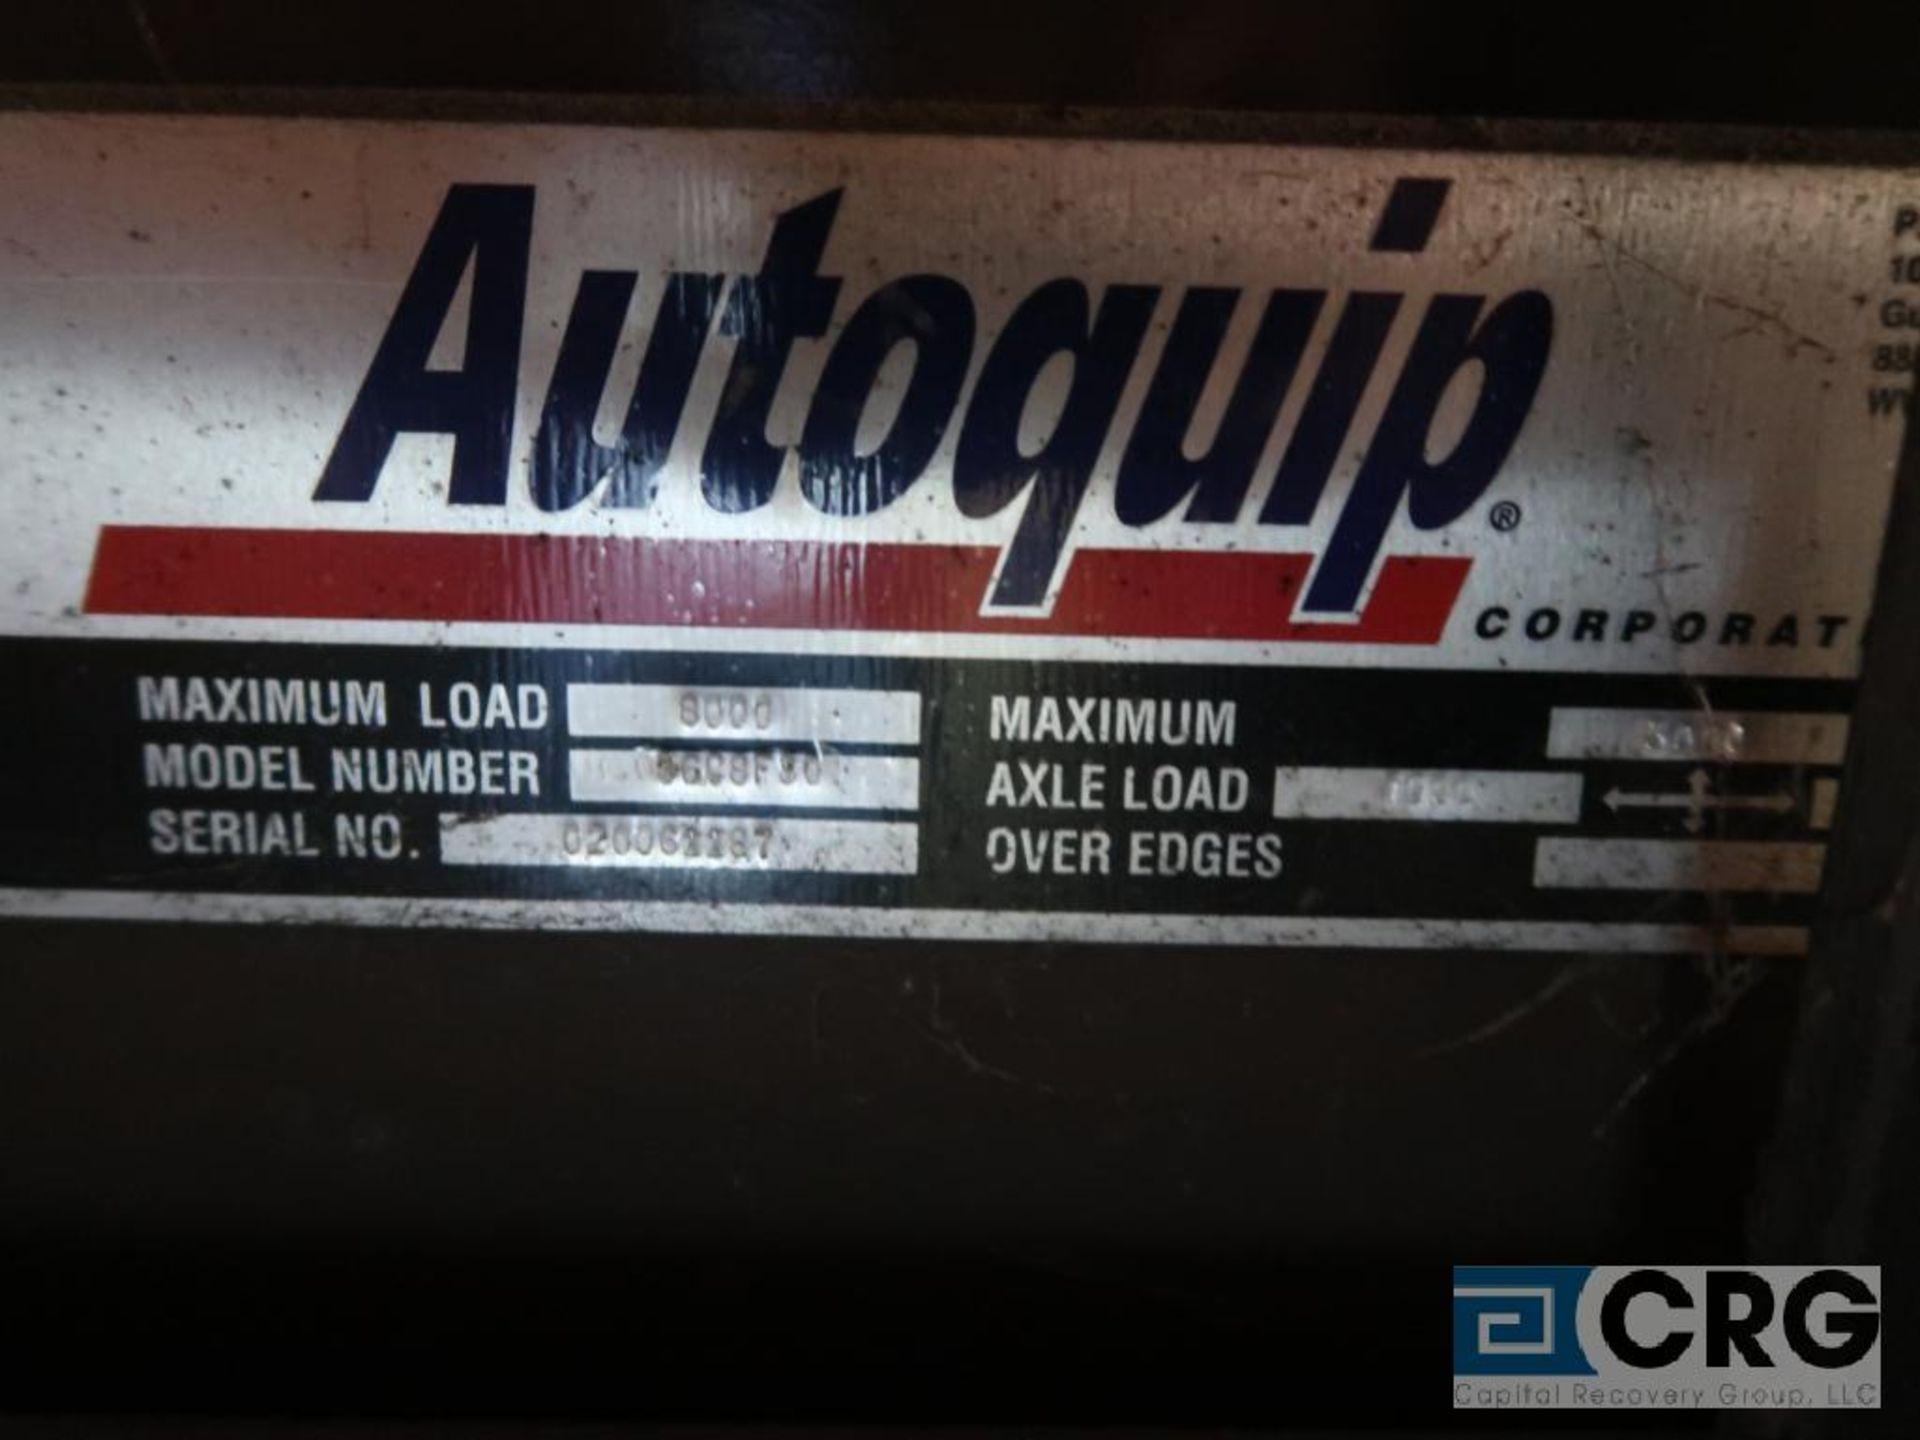 Autoquip GC8FJ hydraulic lift table, 64 in. L x 24 in. W, 8,000 lb. cap., s/n 61187 (Off Site - Image 2 of 2